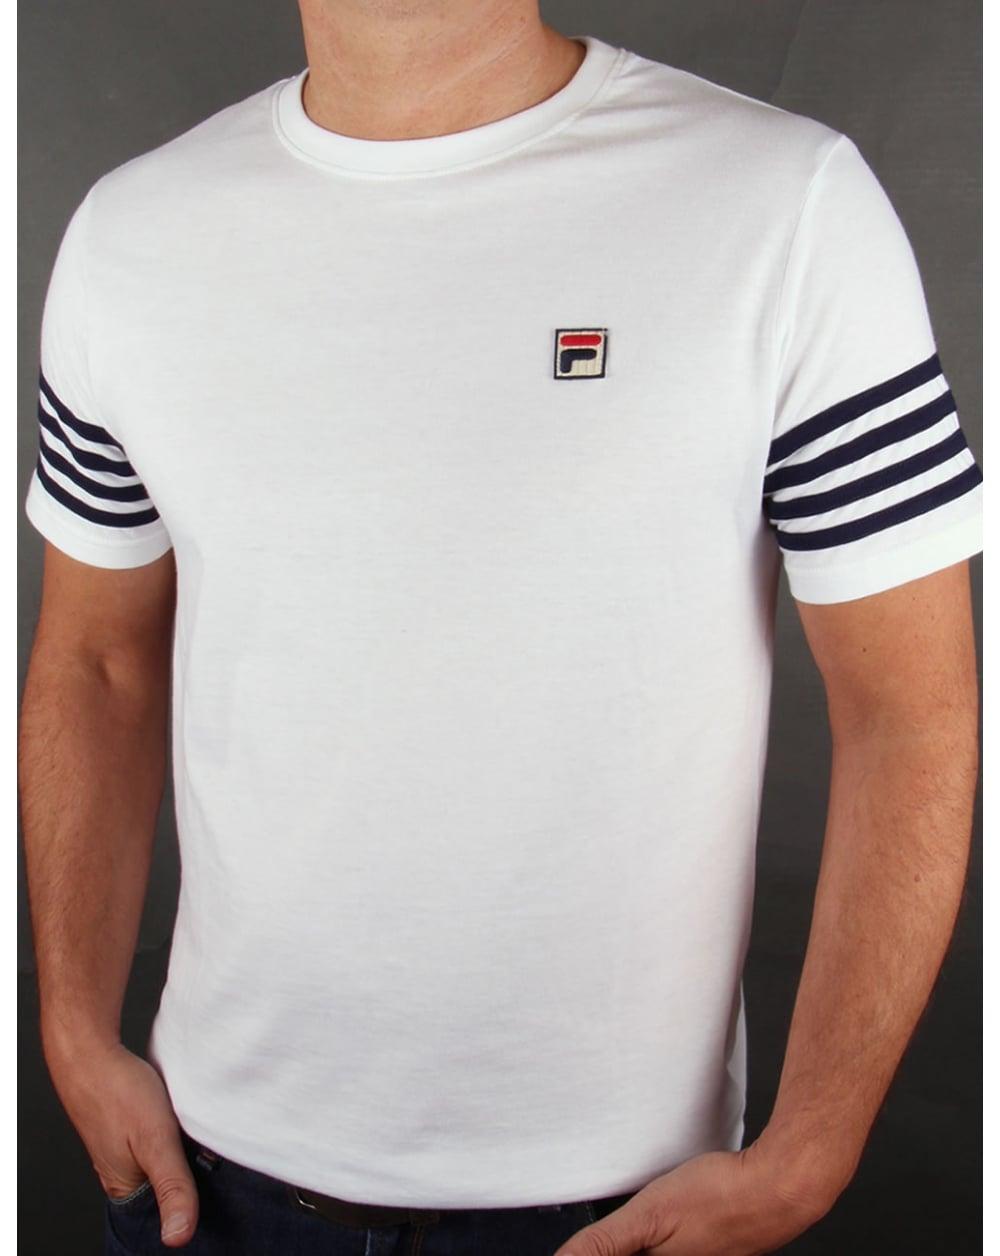 fila vintage 4 stripe t shirt white crew neck striped tee mens. Black Bedroom Furniture Sets. Home Design Ideas